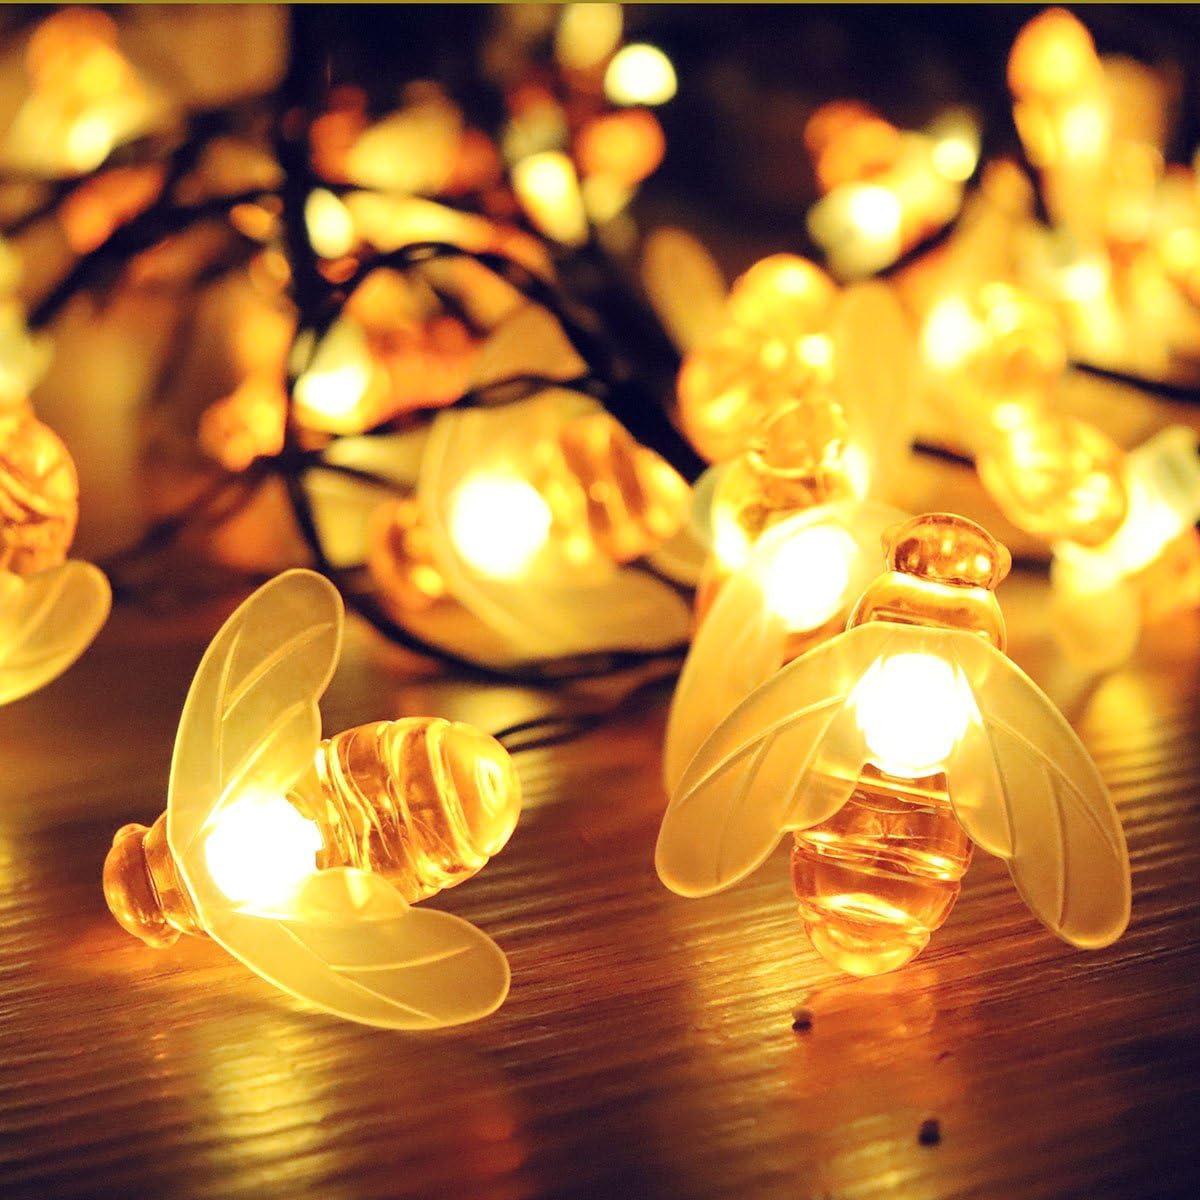 Berocia guirnalda luces exterior solar led luces led solares para exteriores jardin Luces Decorativas Guirnaldas Decoracion Cadena Luces luci natalizie esterno 6.5m 30 LED 8 Modalit/à ip65 Impermeabile